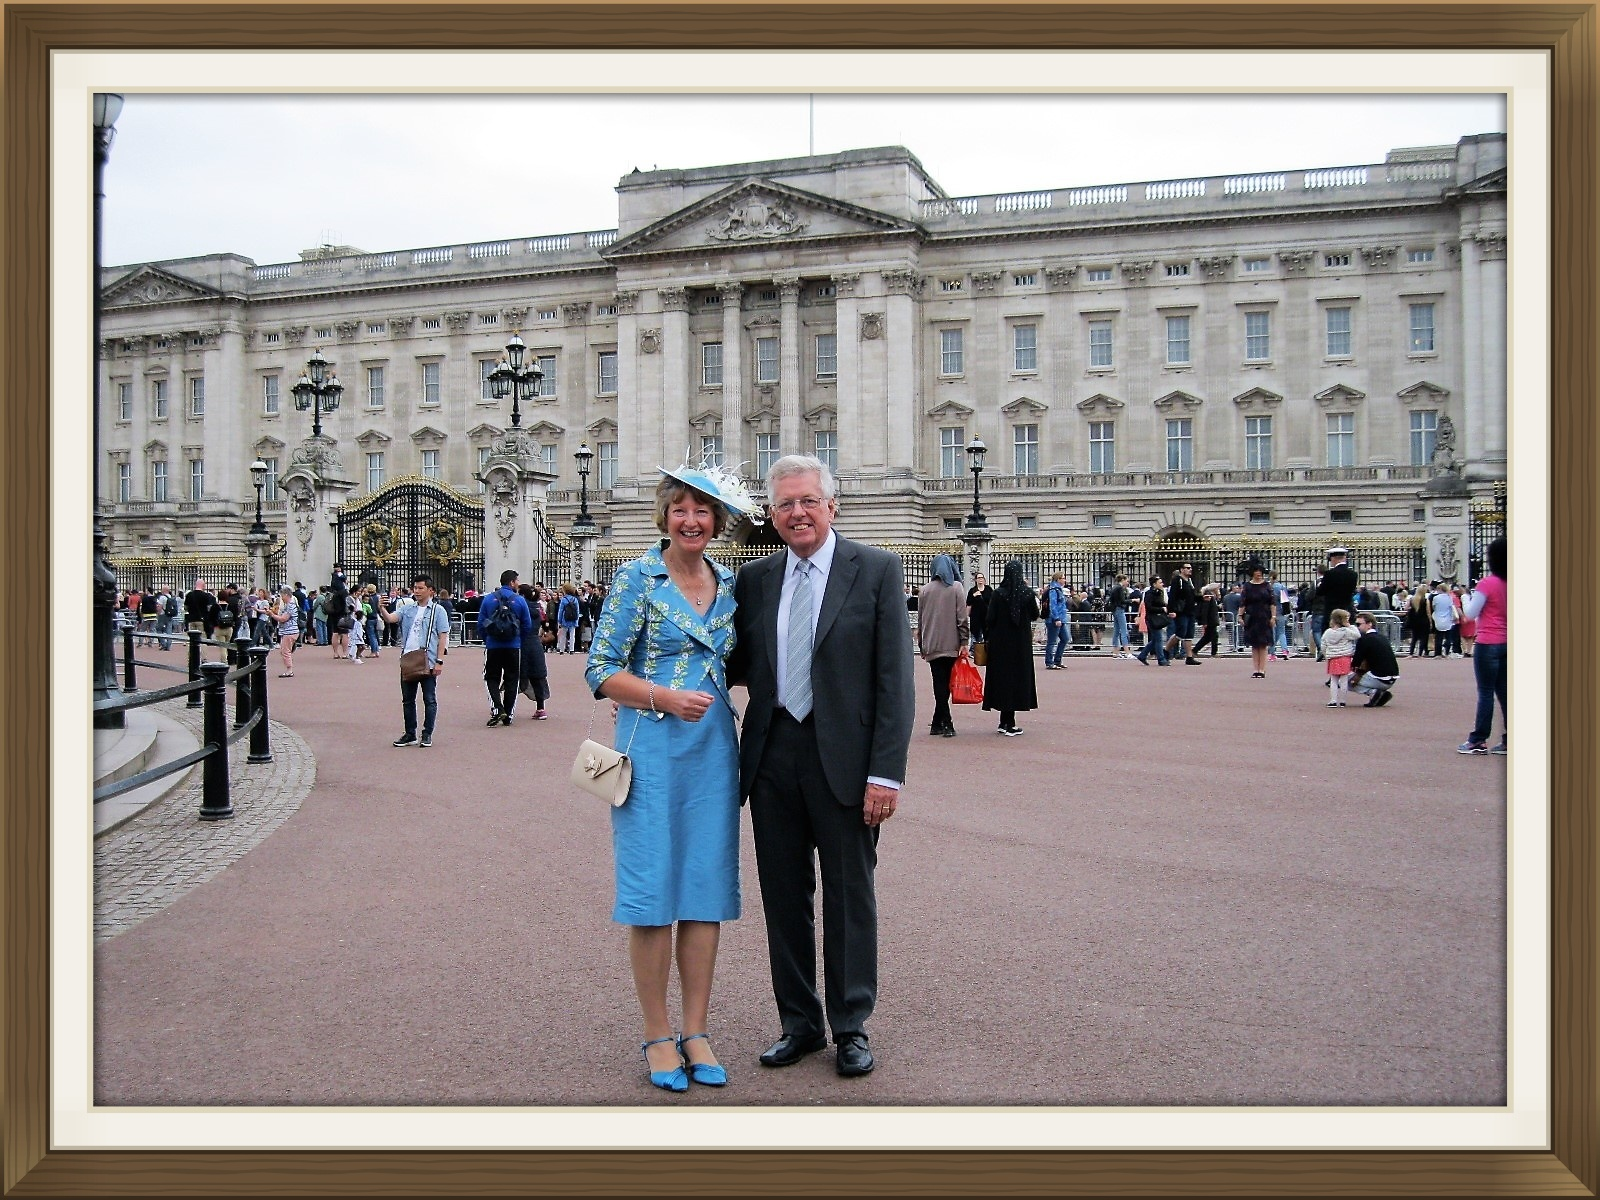 June Trantom and Brian Kurton at Buckingham Palace